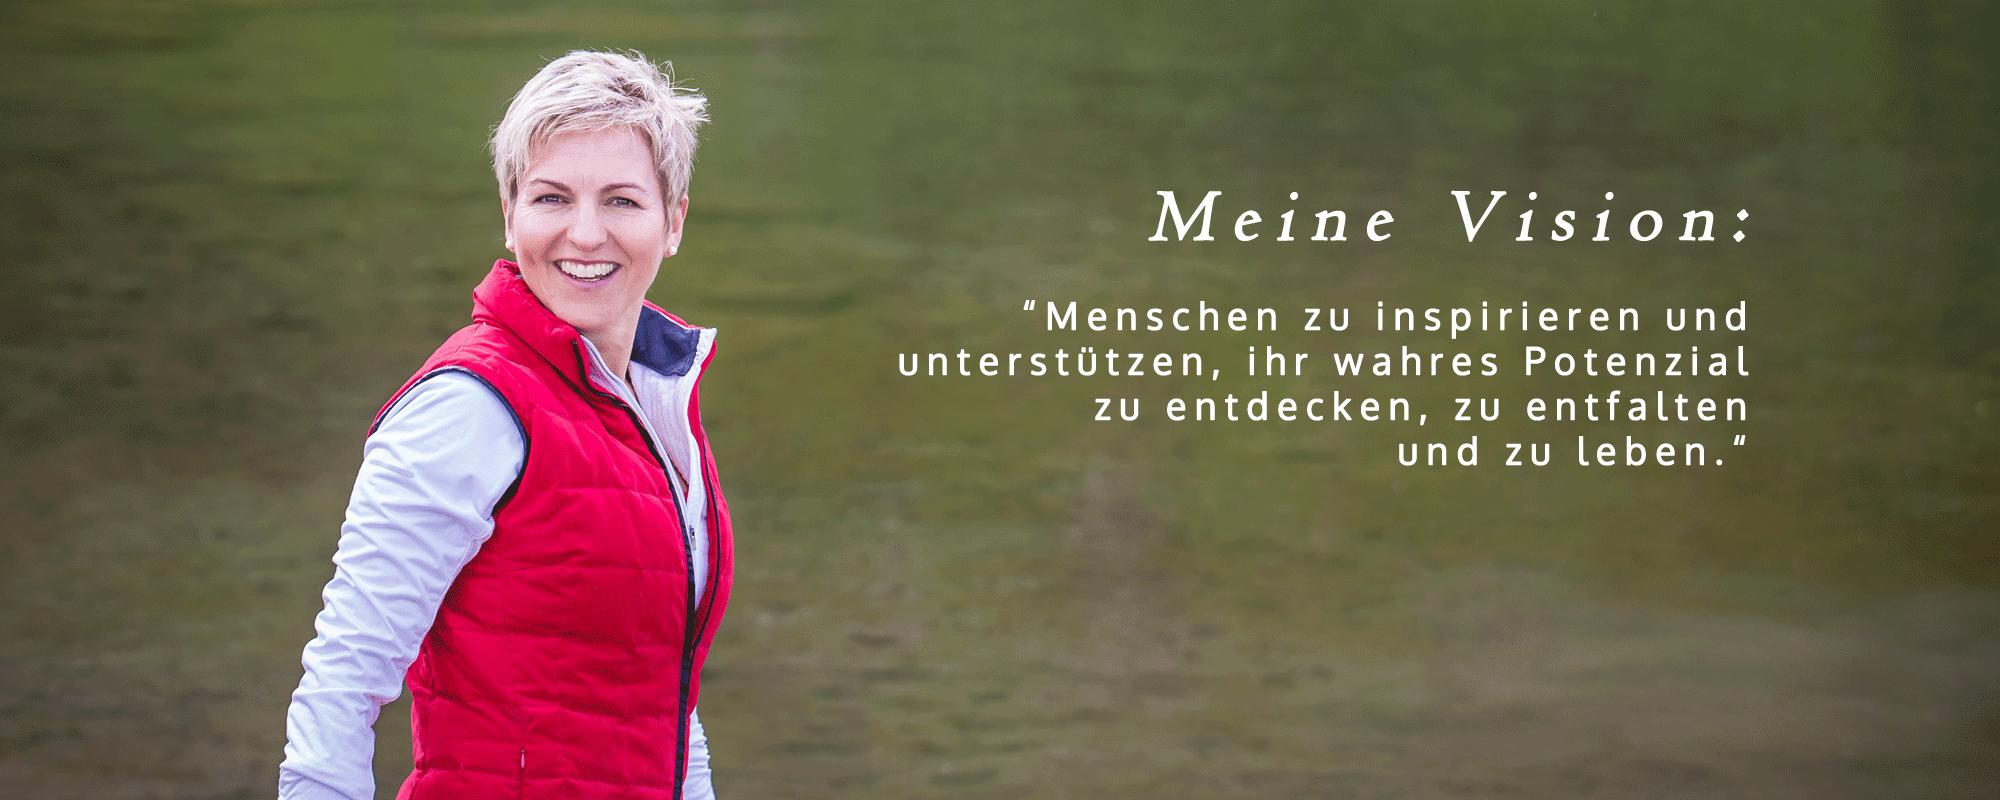 Claudia Strobl, Erfolgstraining, Trainer, Erfolg, Glück, Motivation, Slalom Prinzip